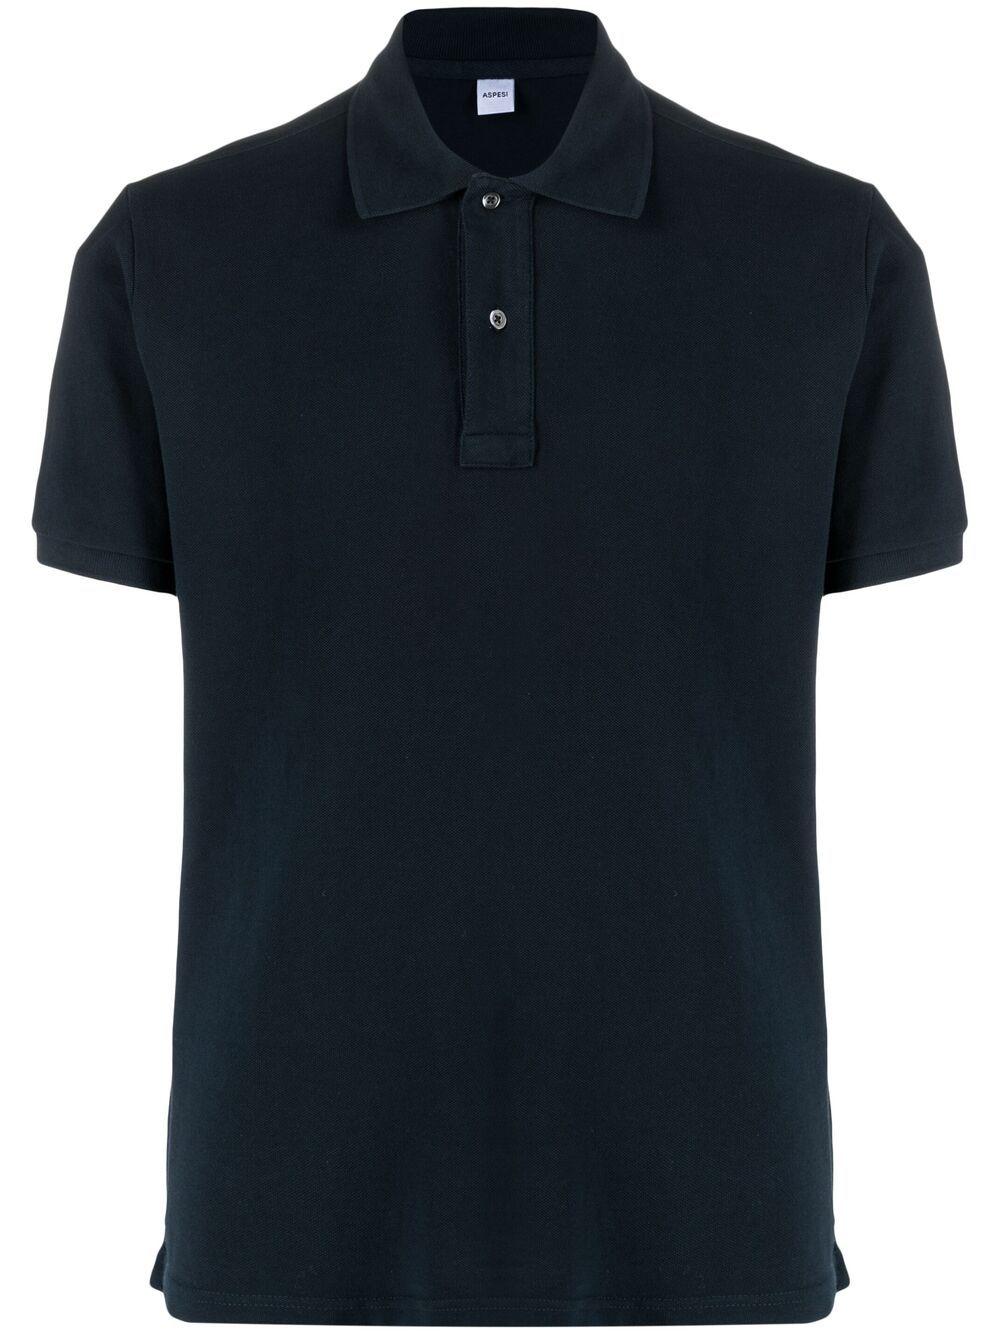 Aspesi cotton polo shirt man black ASPESI | Polo | AY08 G10685098